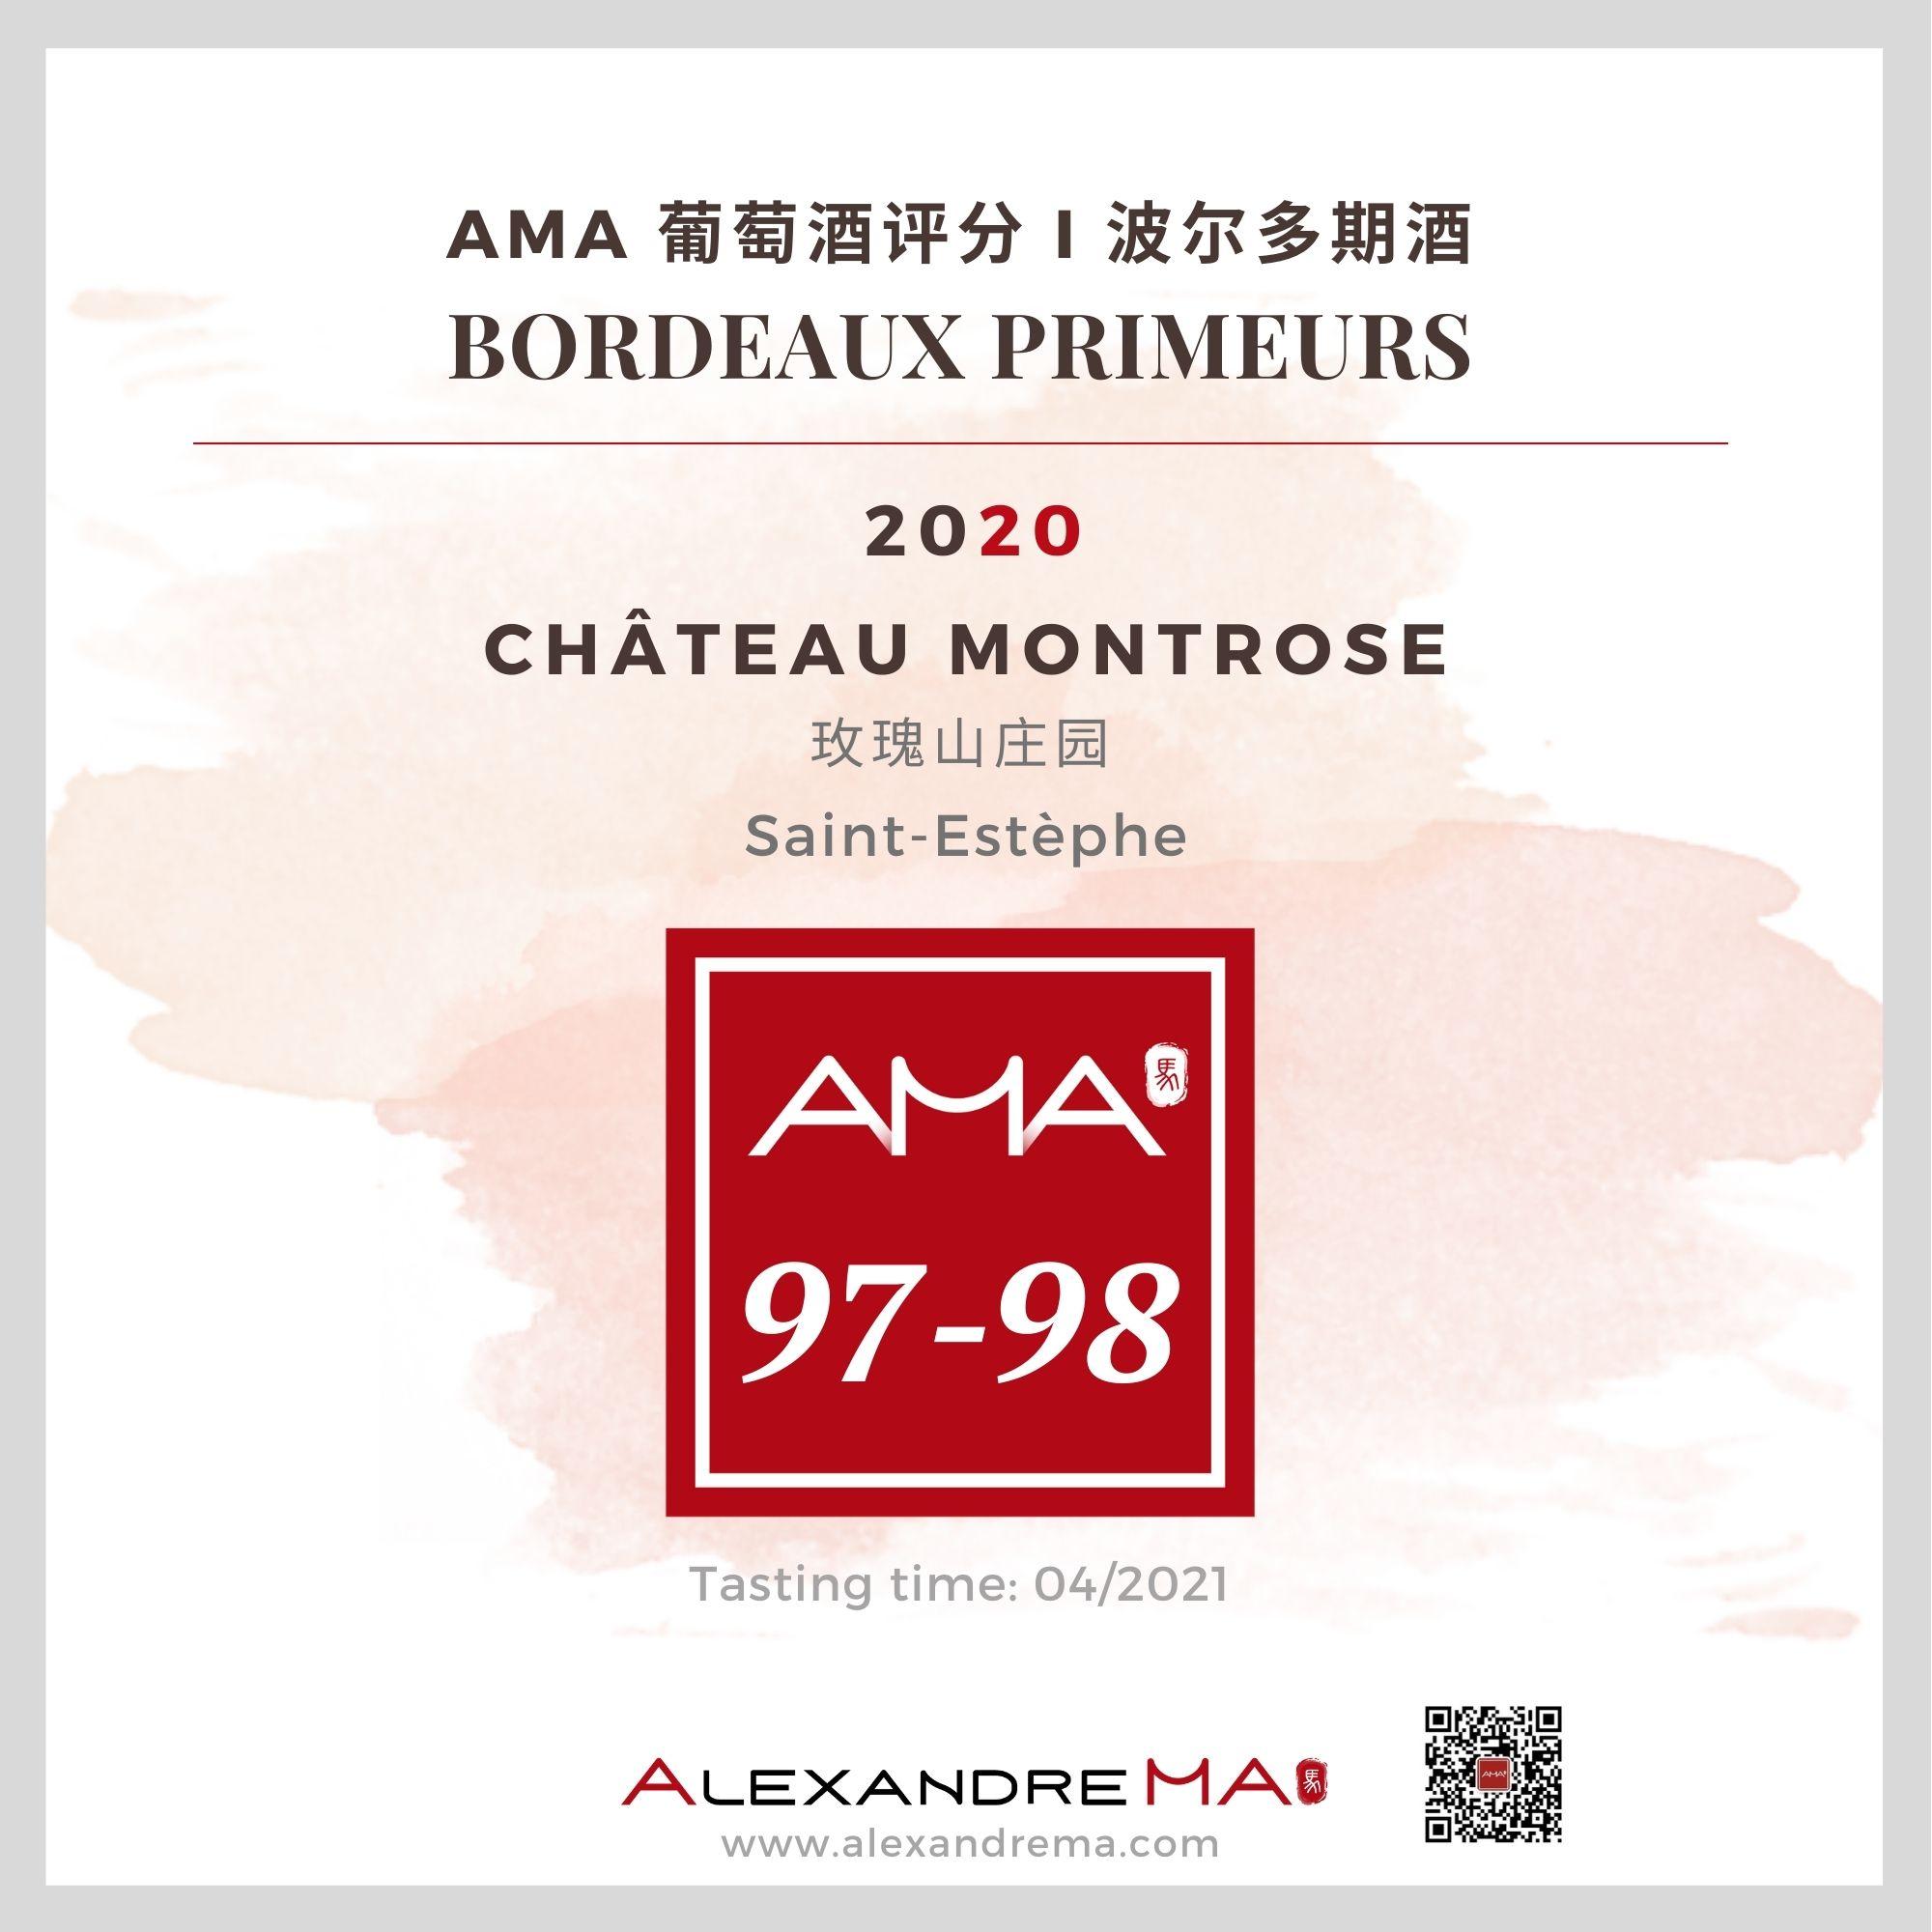 Château Montrose 2020 玫瑰山庄园 - Alexandre Ma